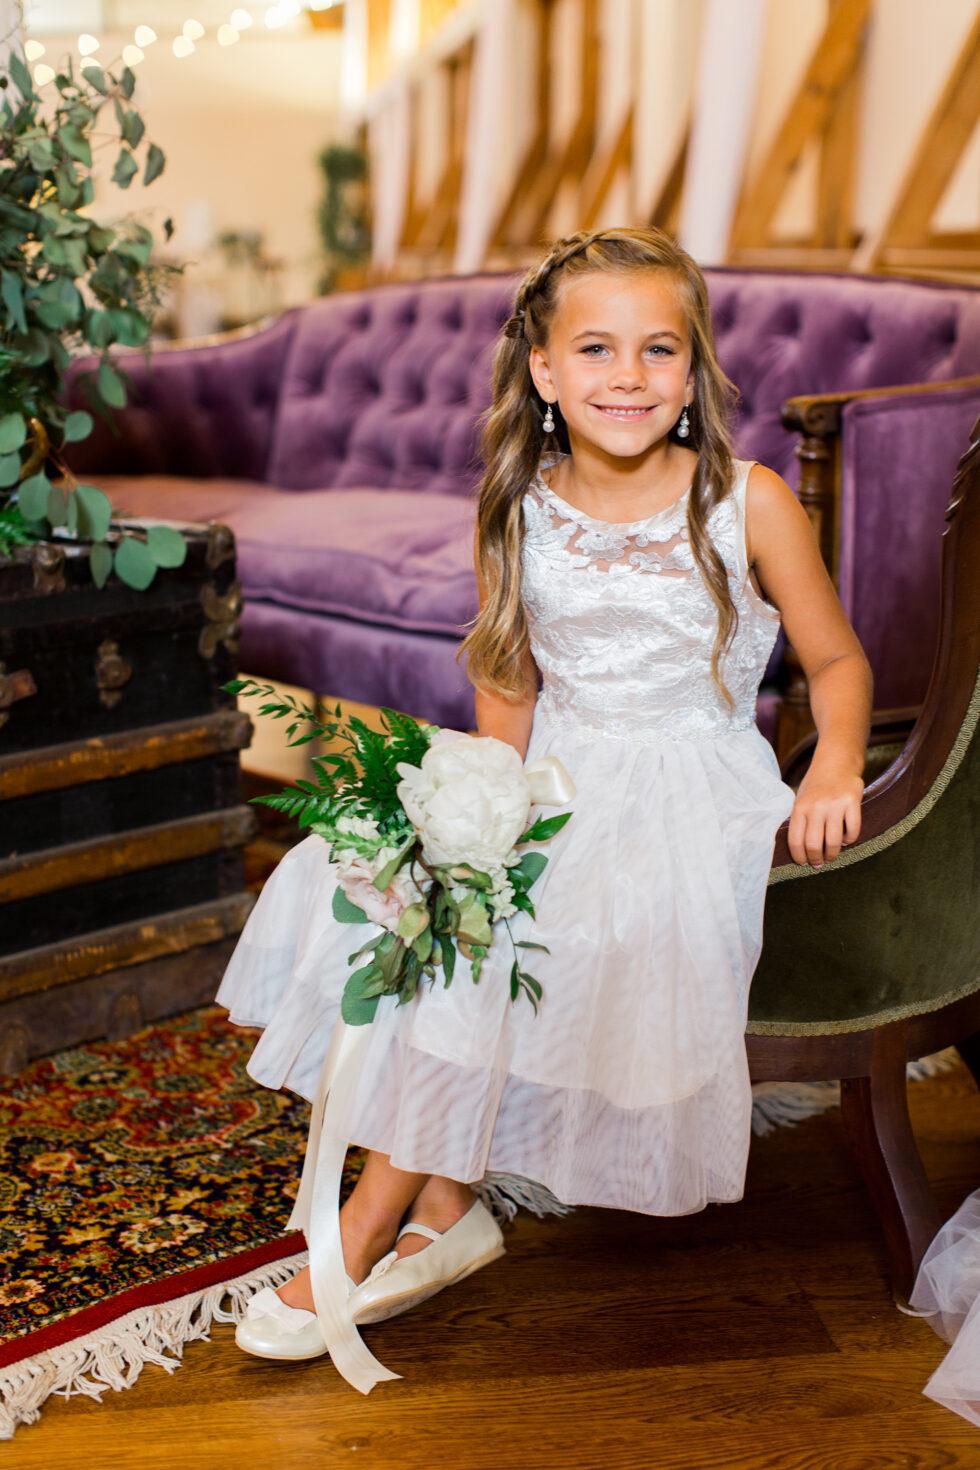 The-Prettiest-Pieces-Fall-Wedding-Winmock-North-Carolina-03